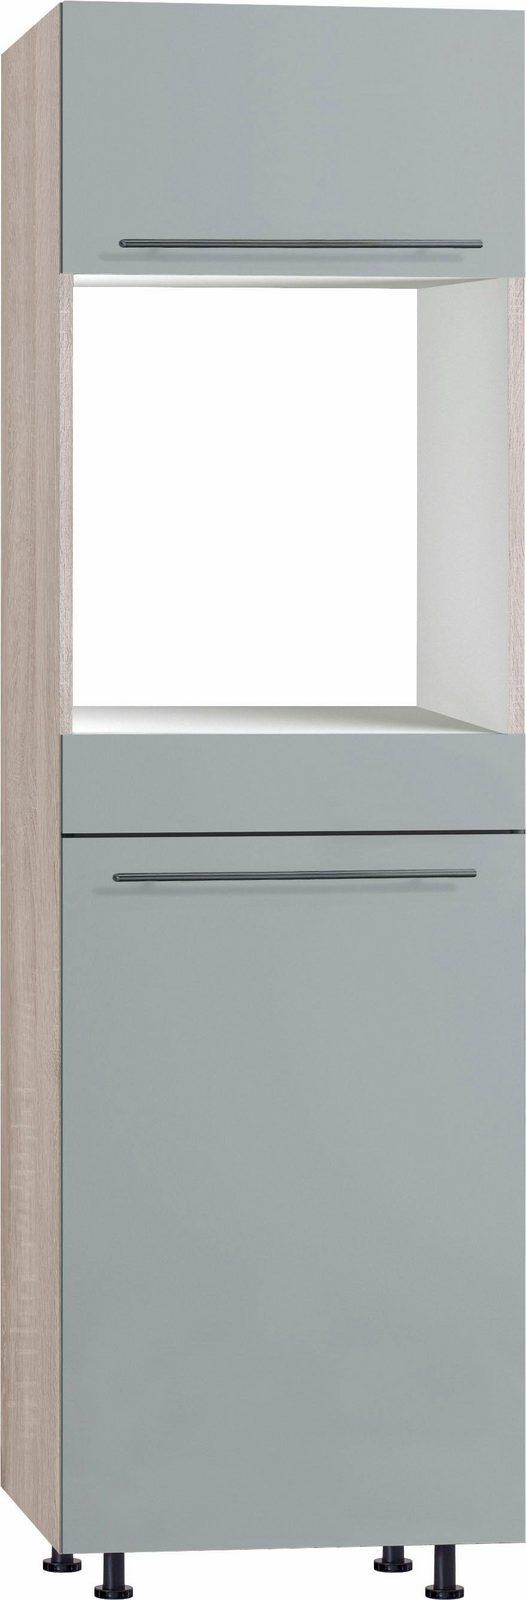 OPTIFIT »Bern« Backofen-/Kühlschrank-Umbauschrank jetztbilligerkaufen